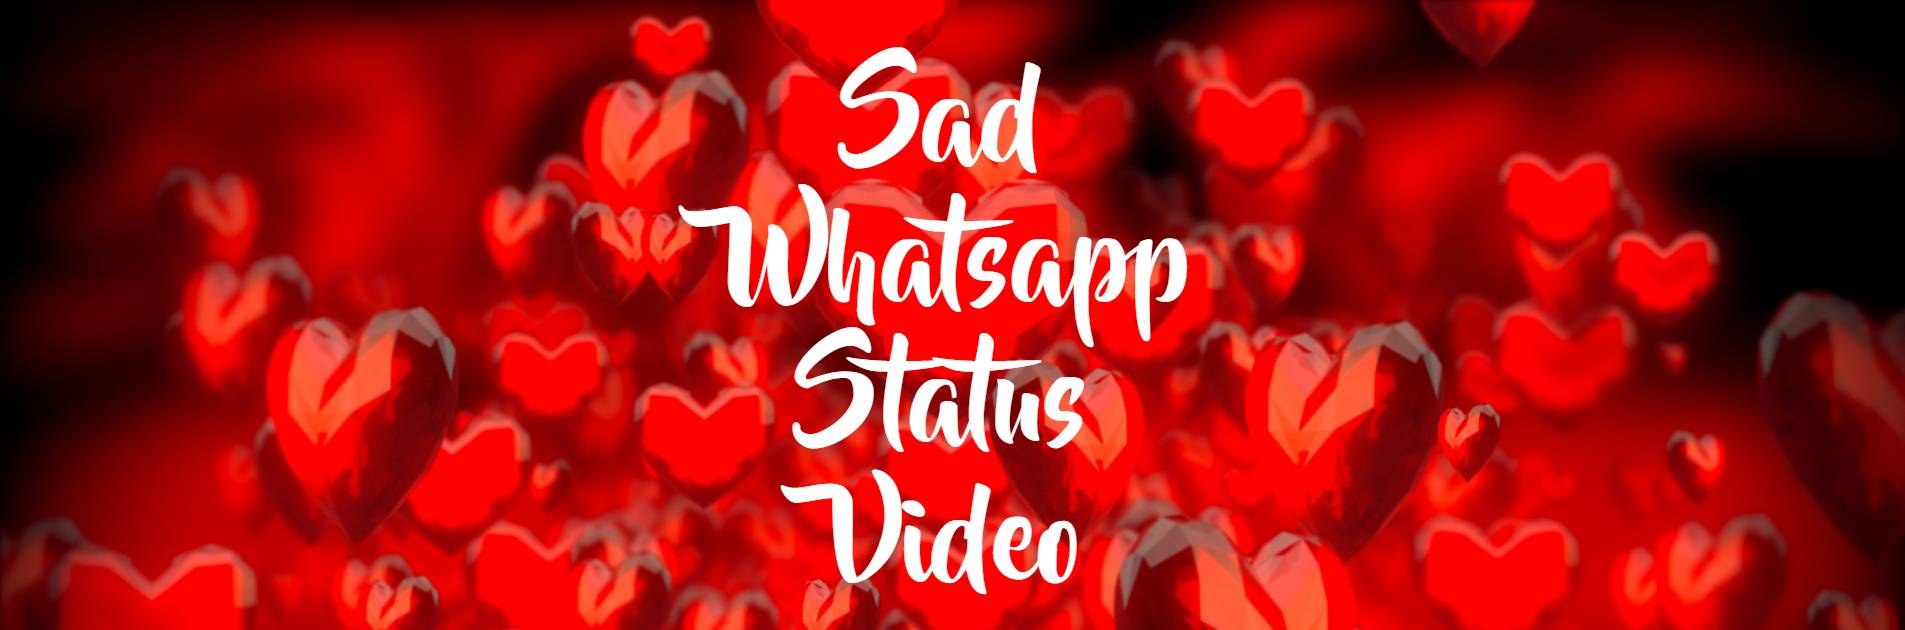 Sad Whatsapp Status Video Download Sad Ematational Status Video Download whatsapp for windows now from softonic: sad whatsapp status video download sad